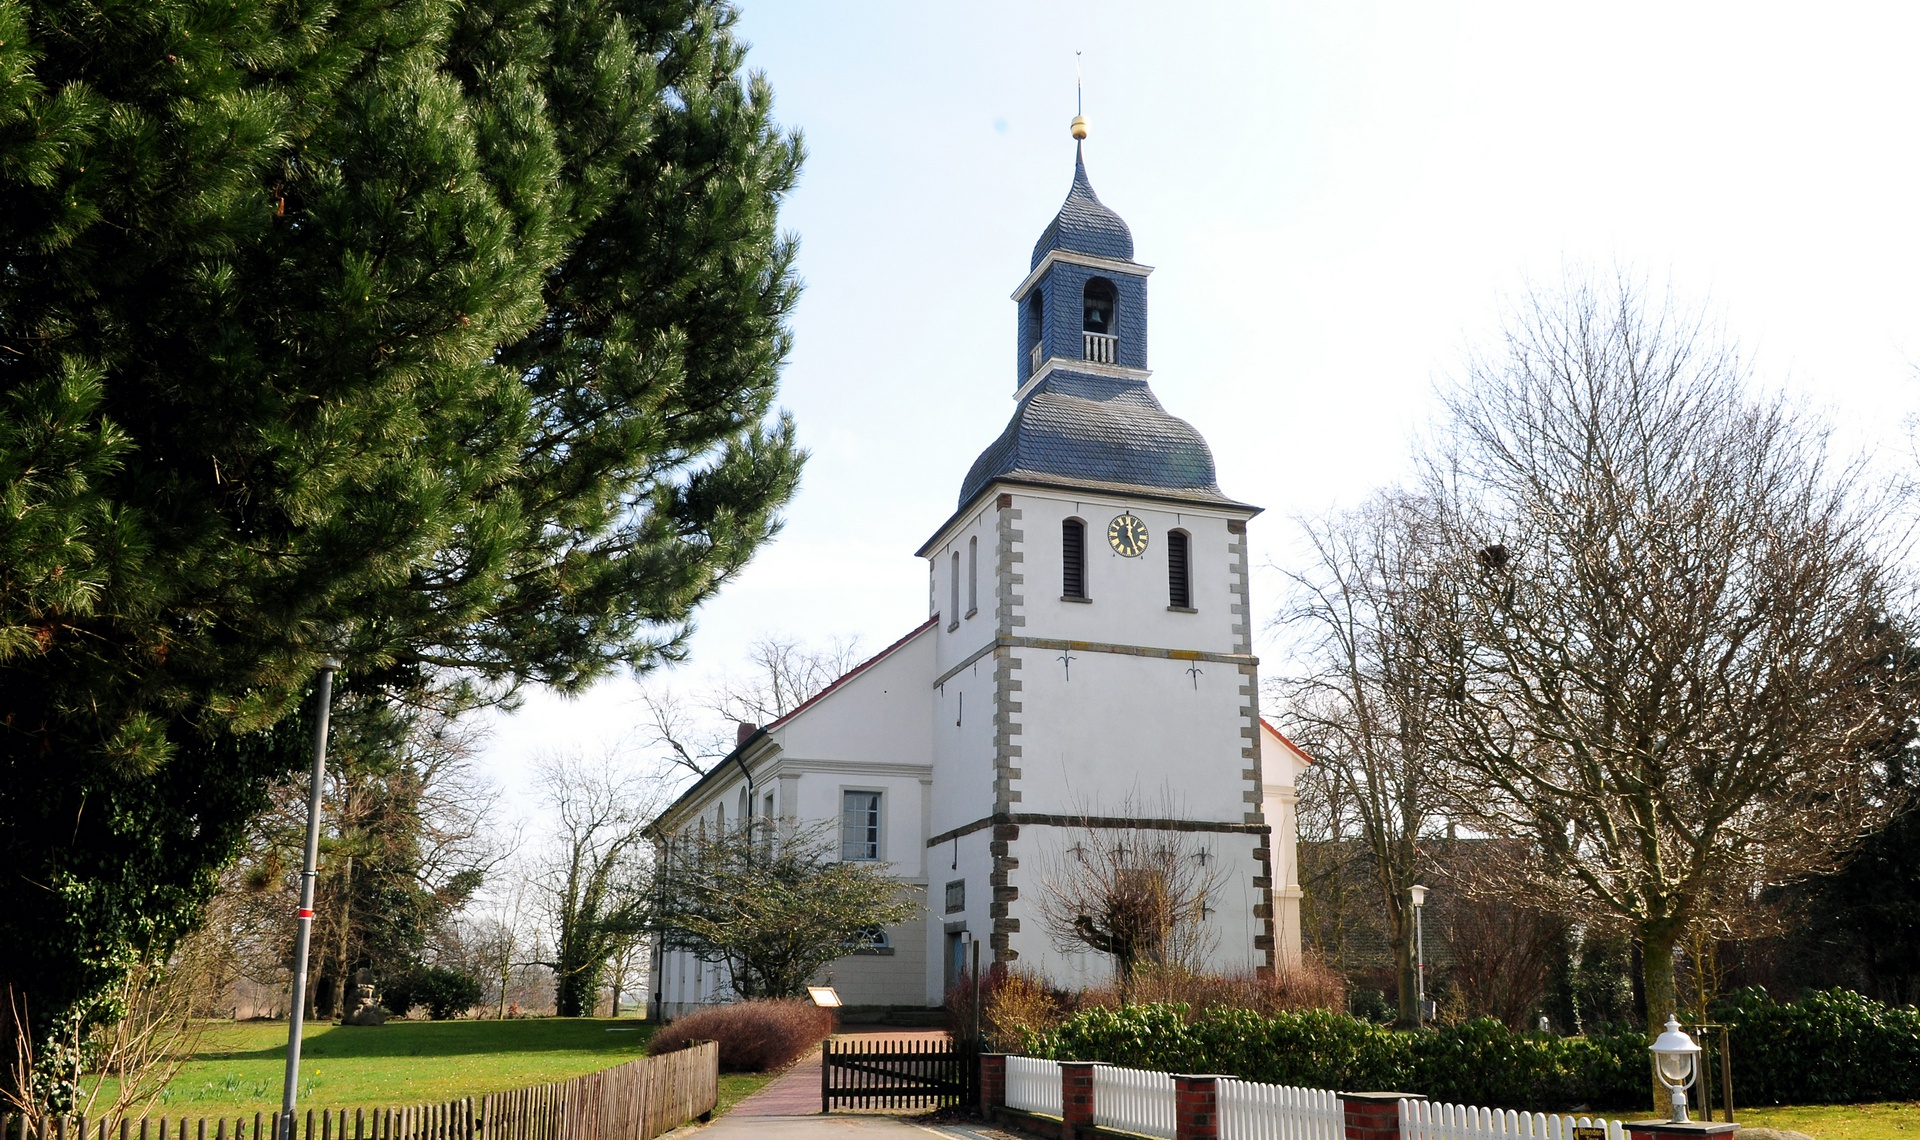 Rathaus_Startseite_Kirche_Blender